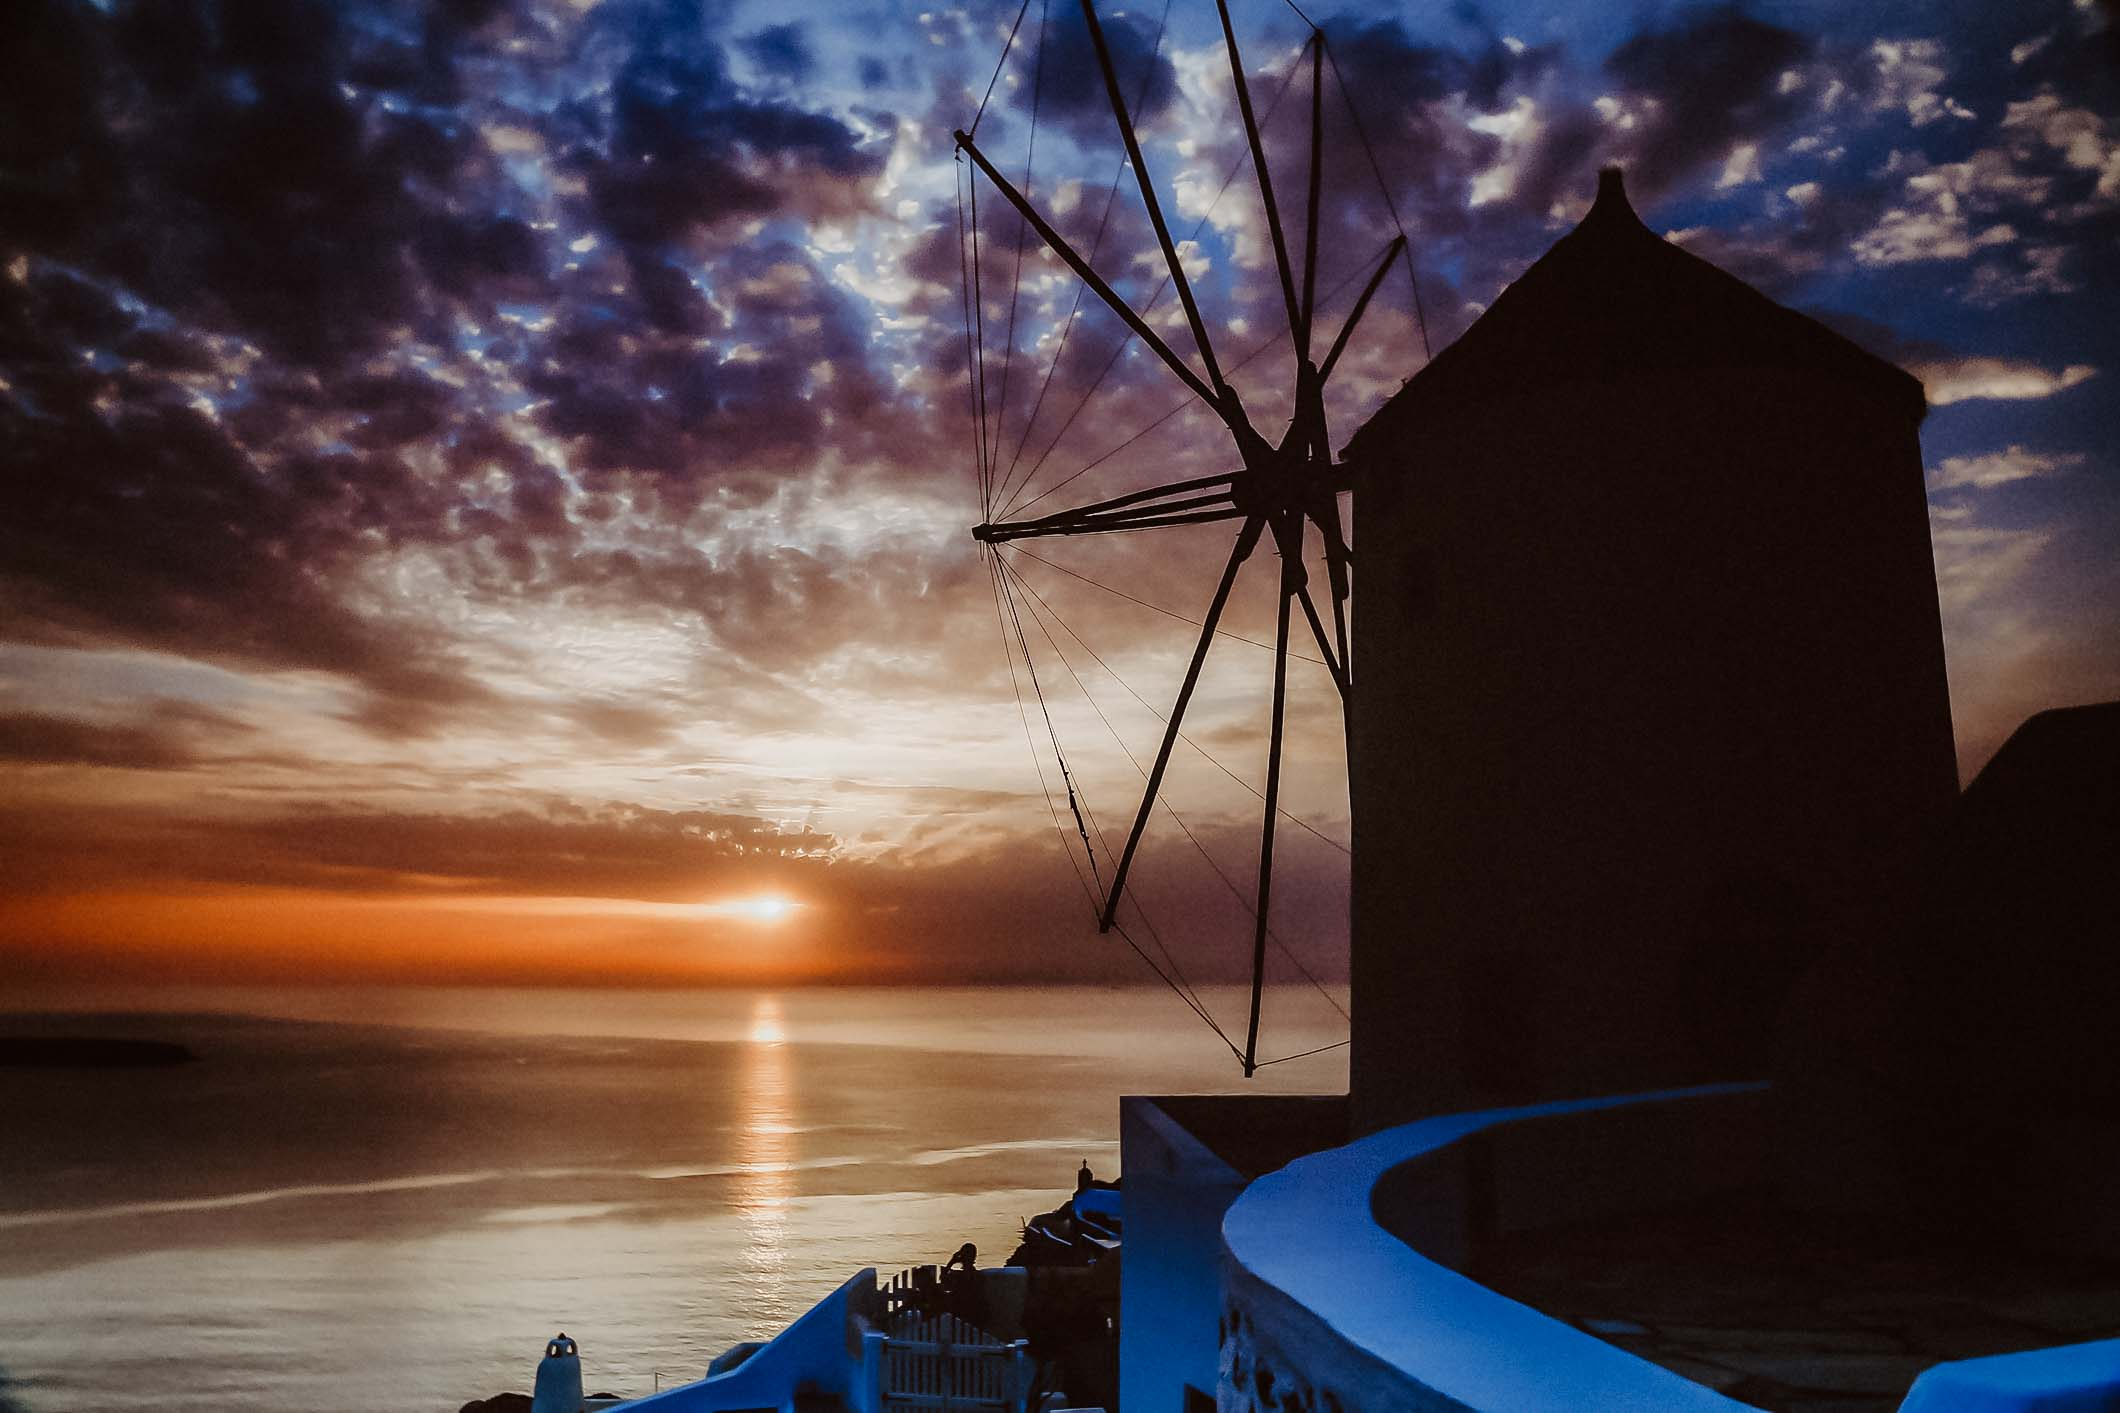 blog-image-sunset-Oia-Santorini-Greece-windmill